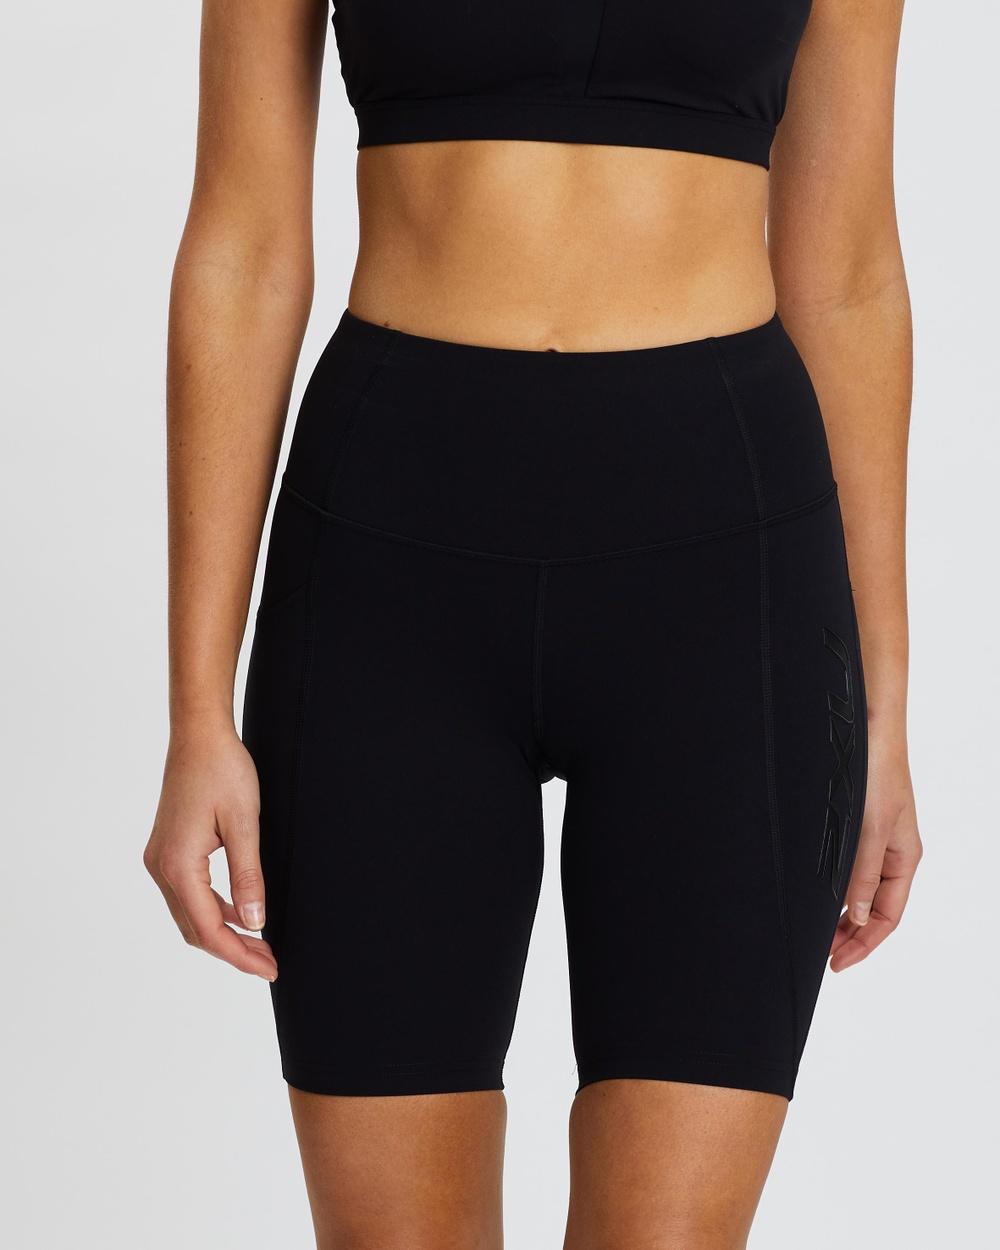 2XU Fitness New Heights Bike Shorts all compression Black & Black